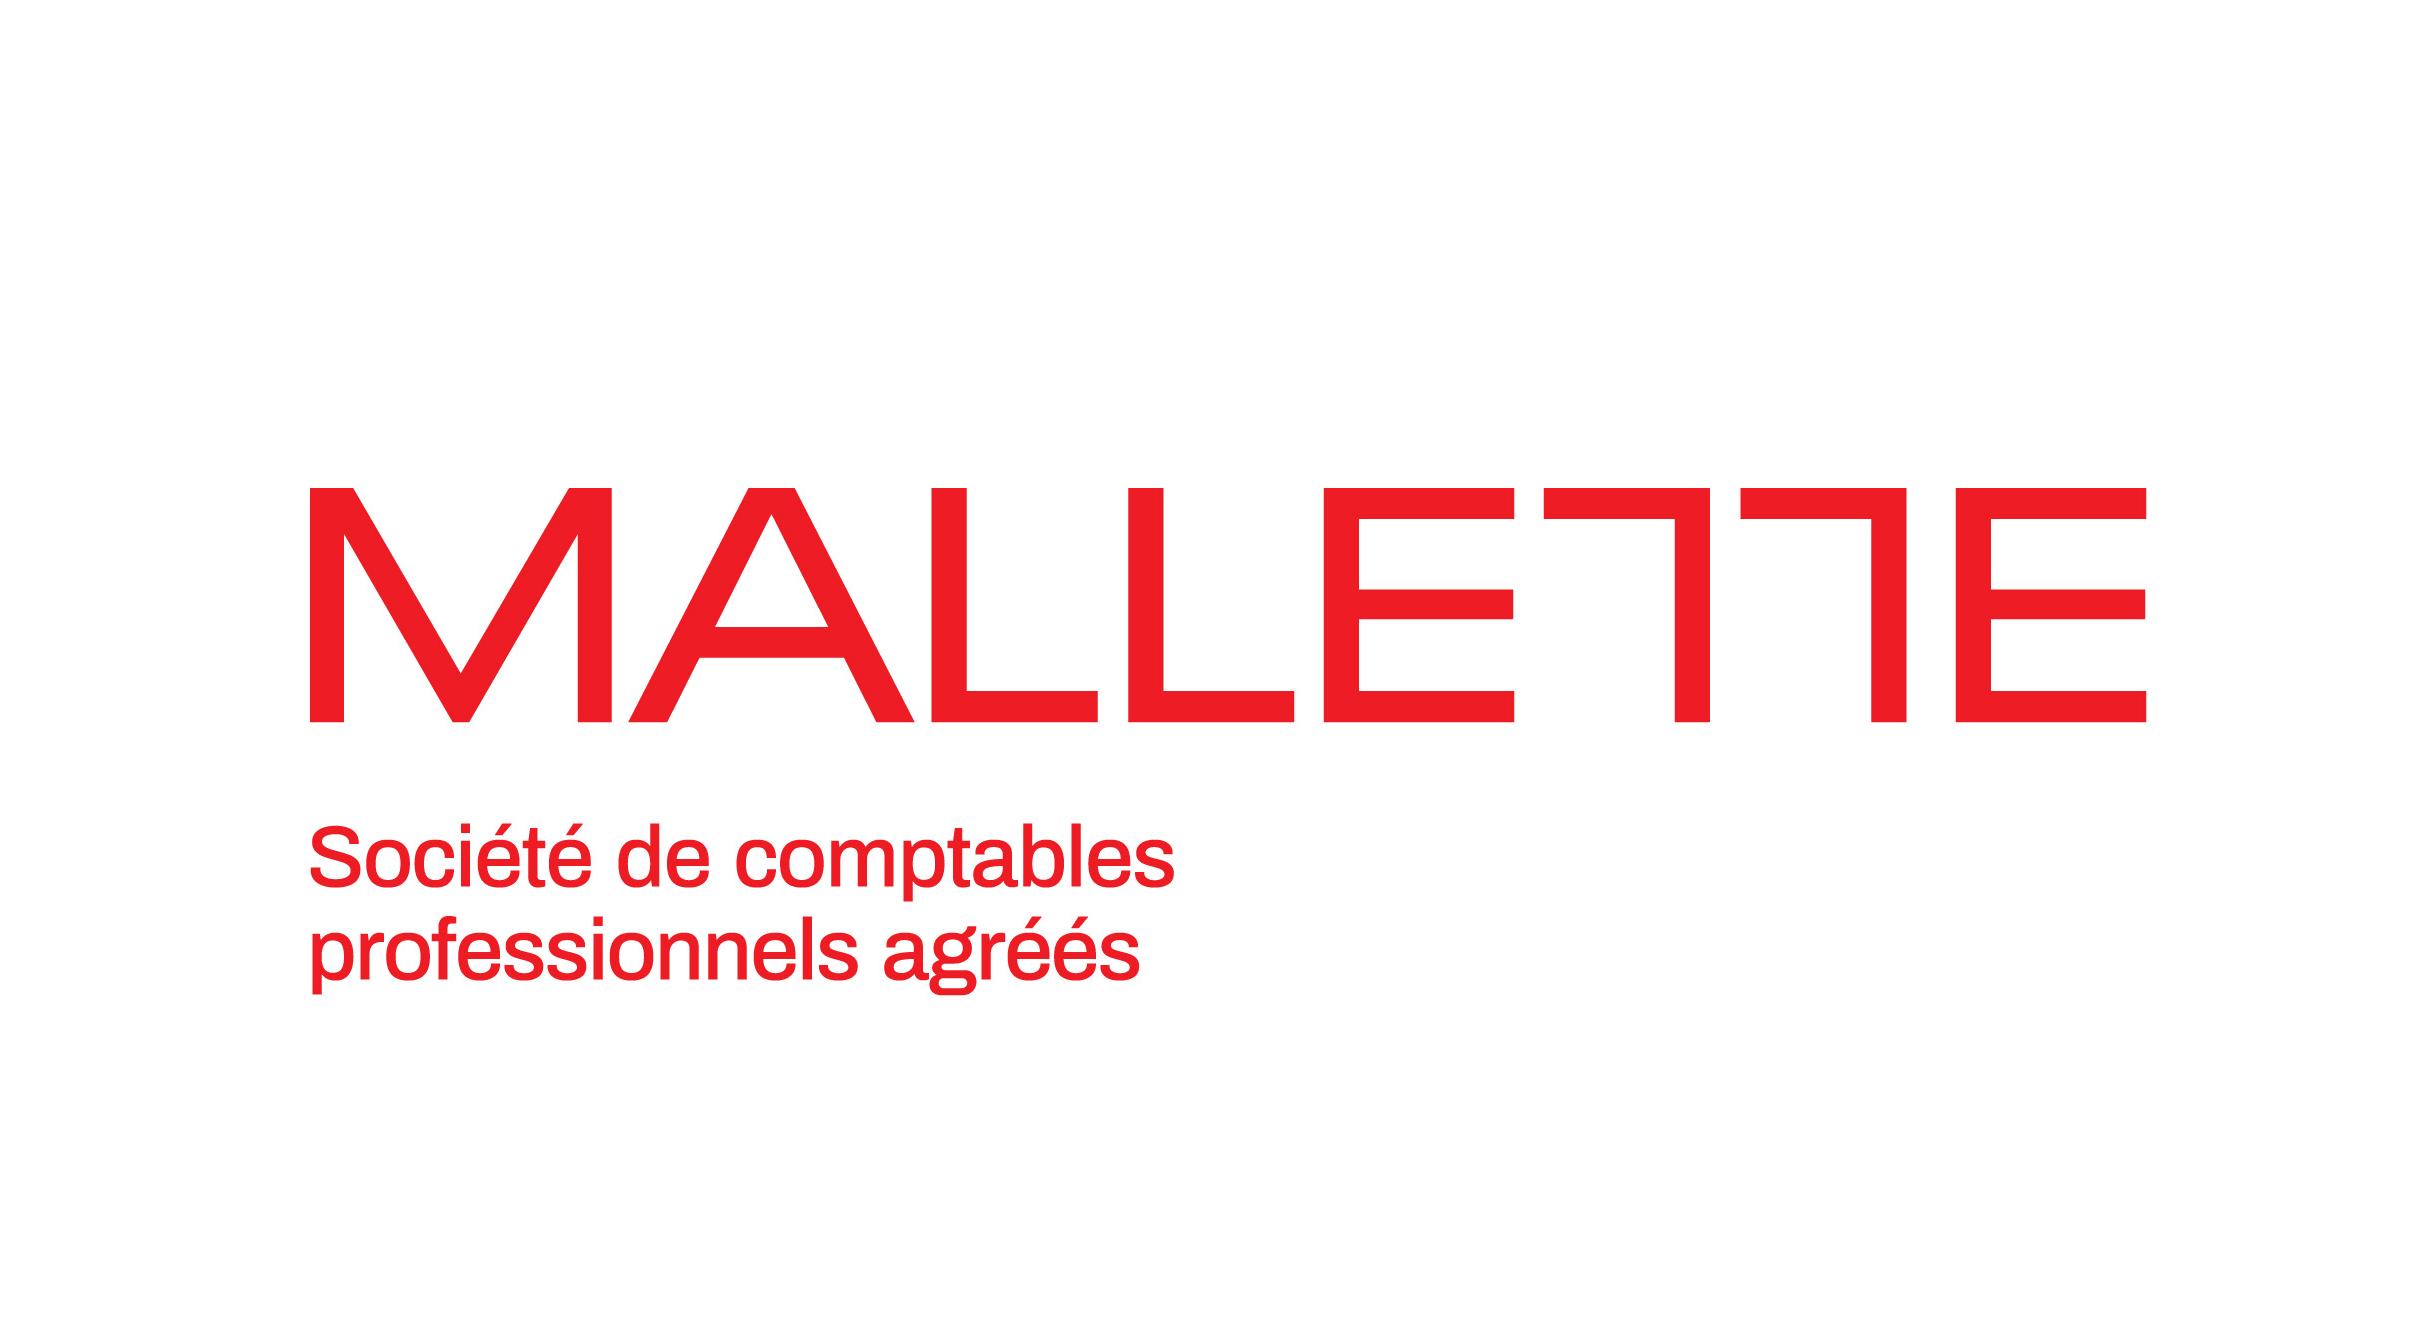 Mallette